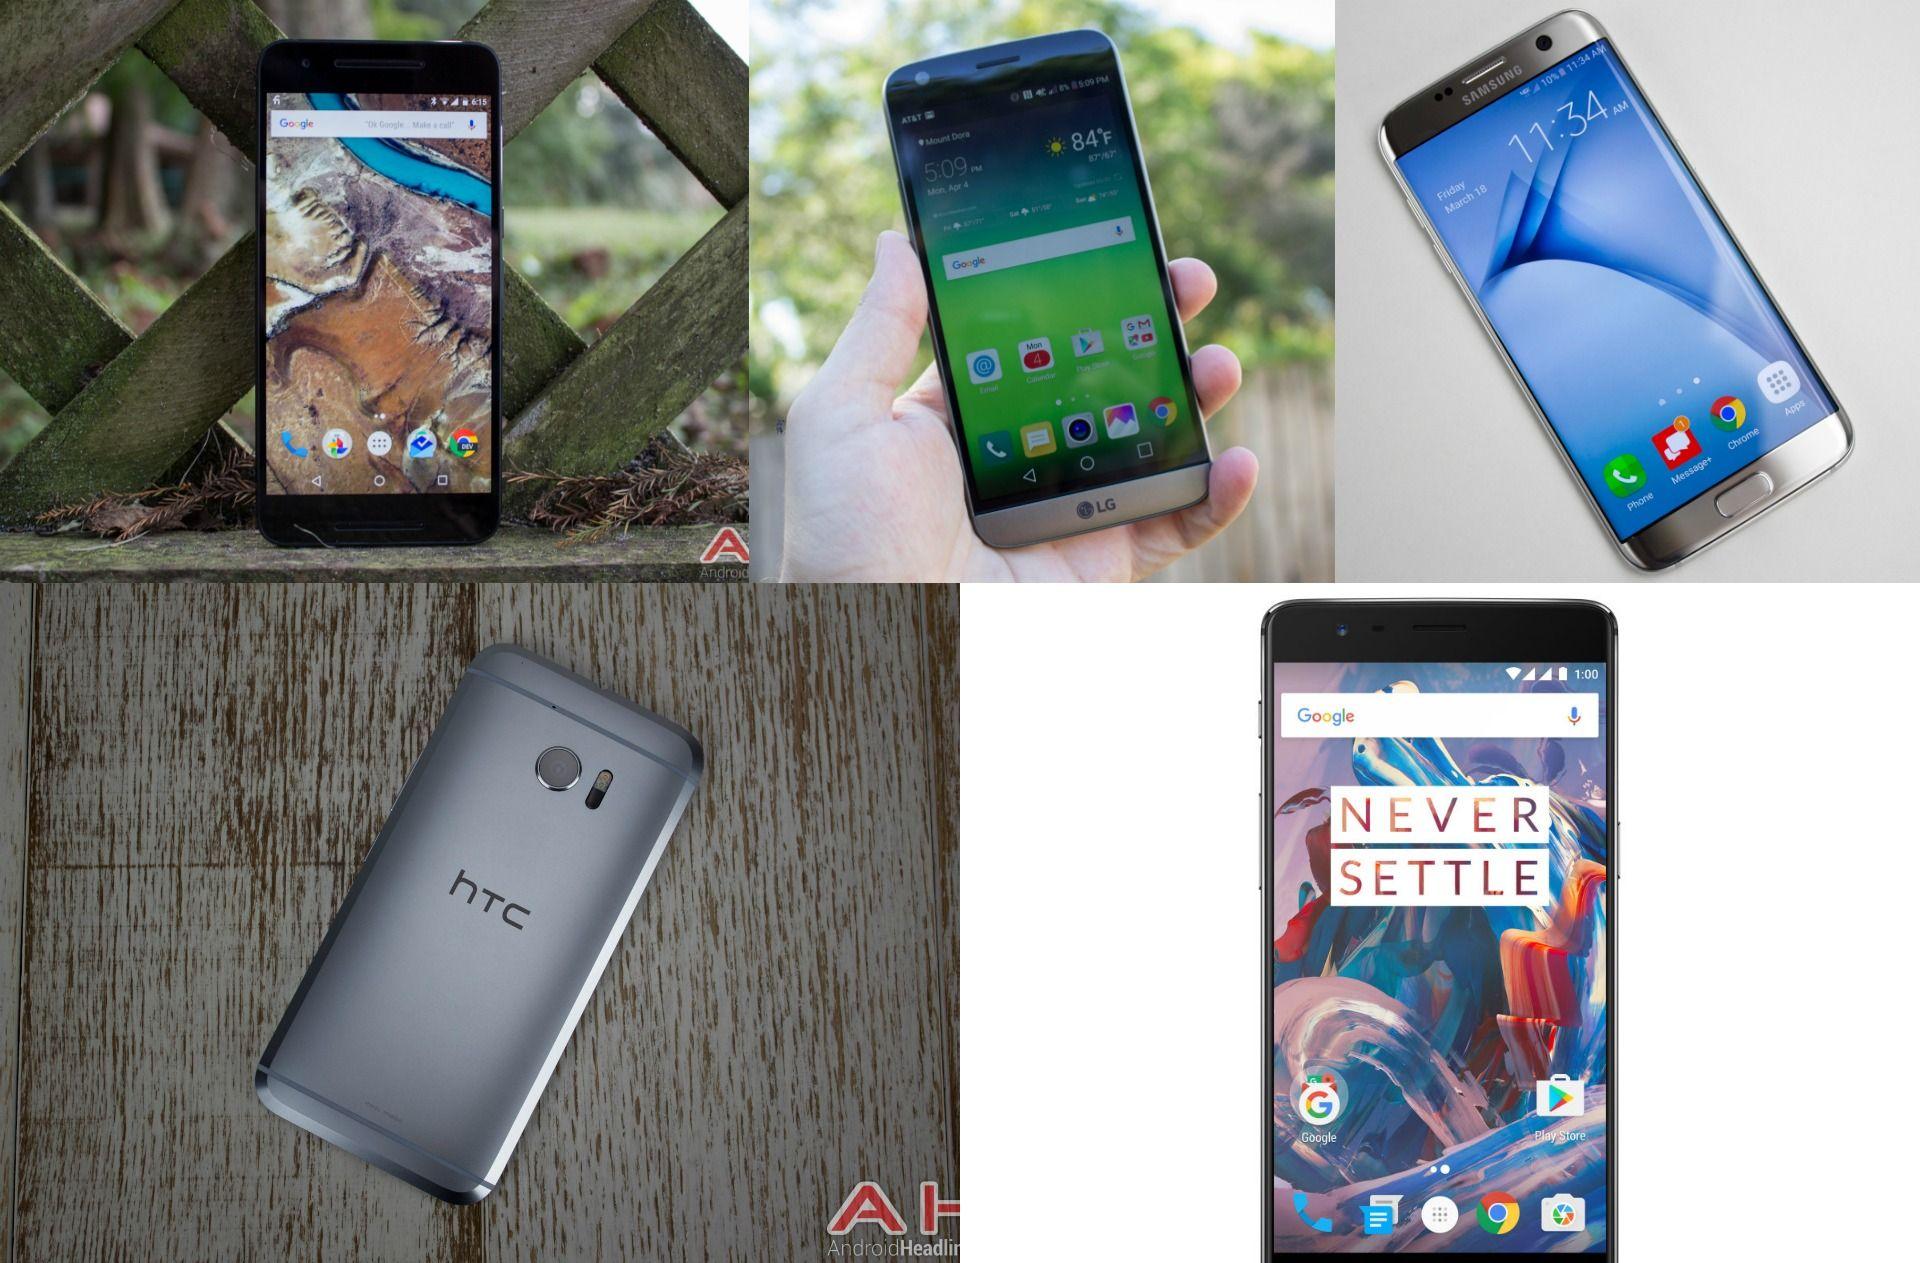 Phone Comparisons: Nexus 6P vs LG G5 vs Galaxy S7 Edge vs HTC 10 vs OnePlus 3 #Android #CES2016 #Google